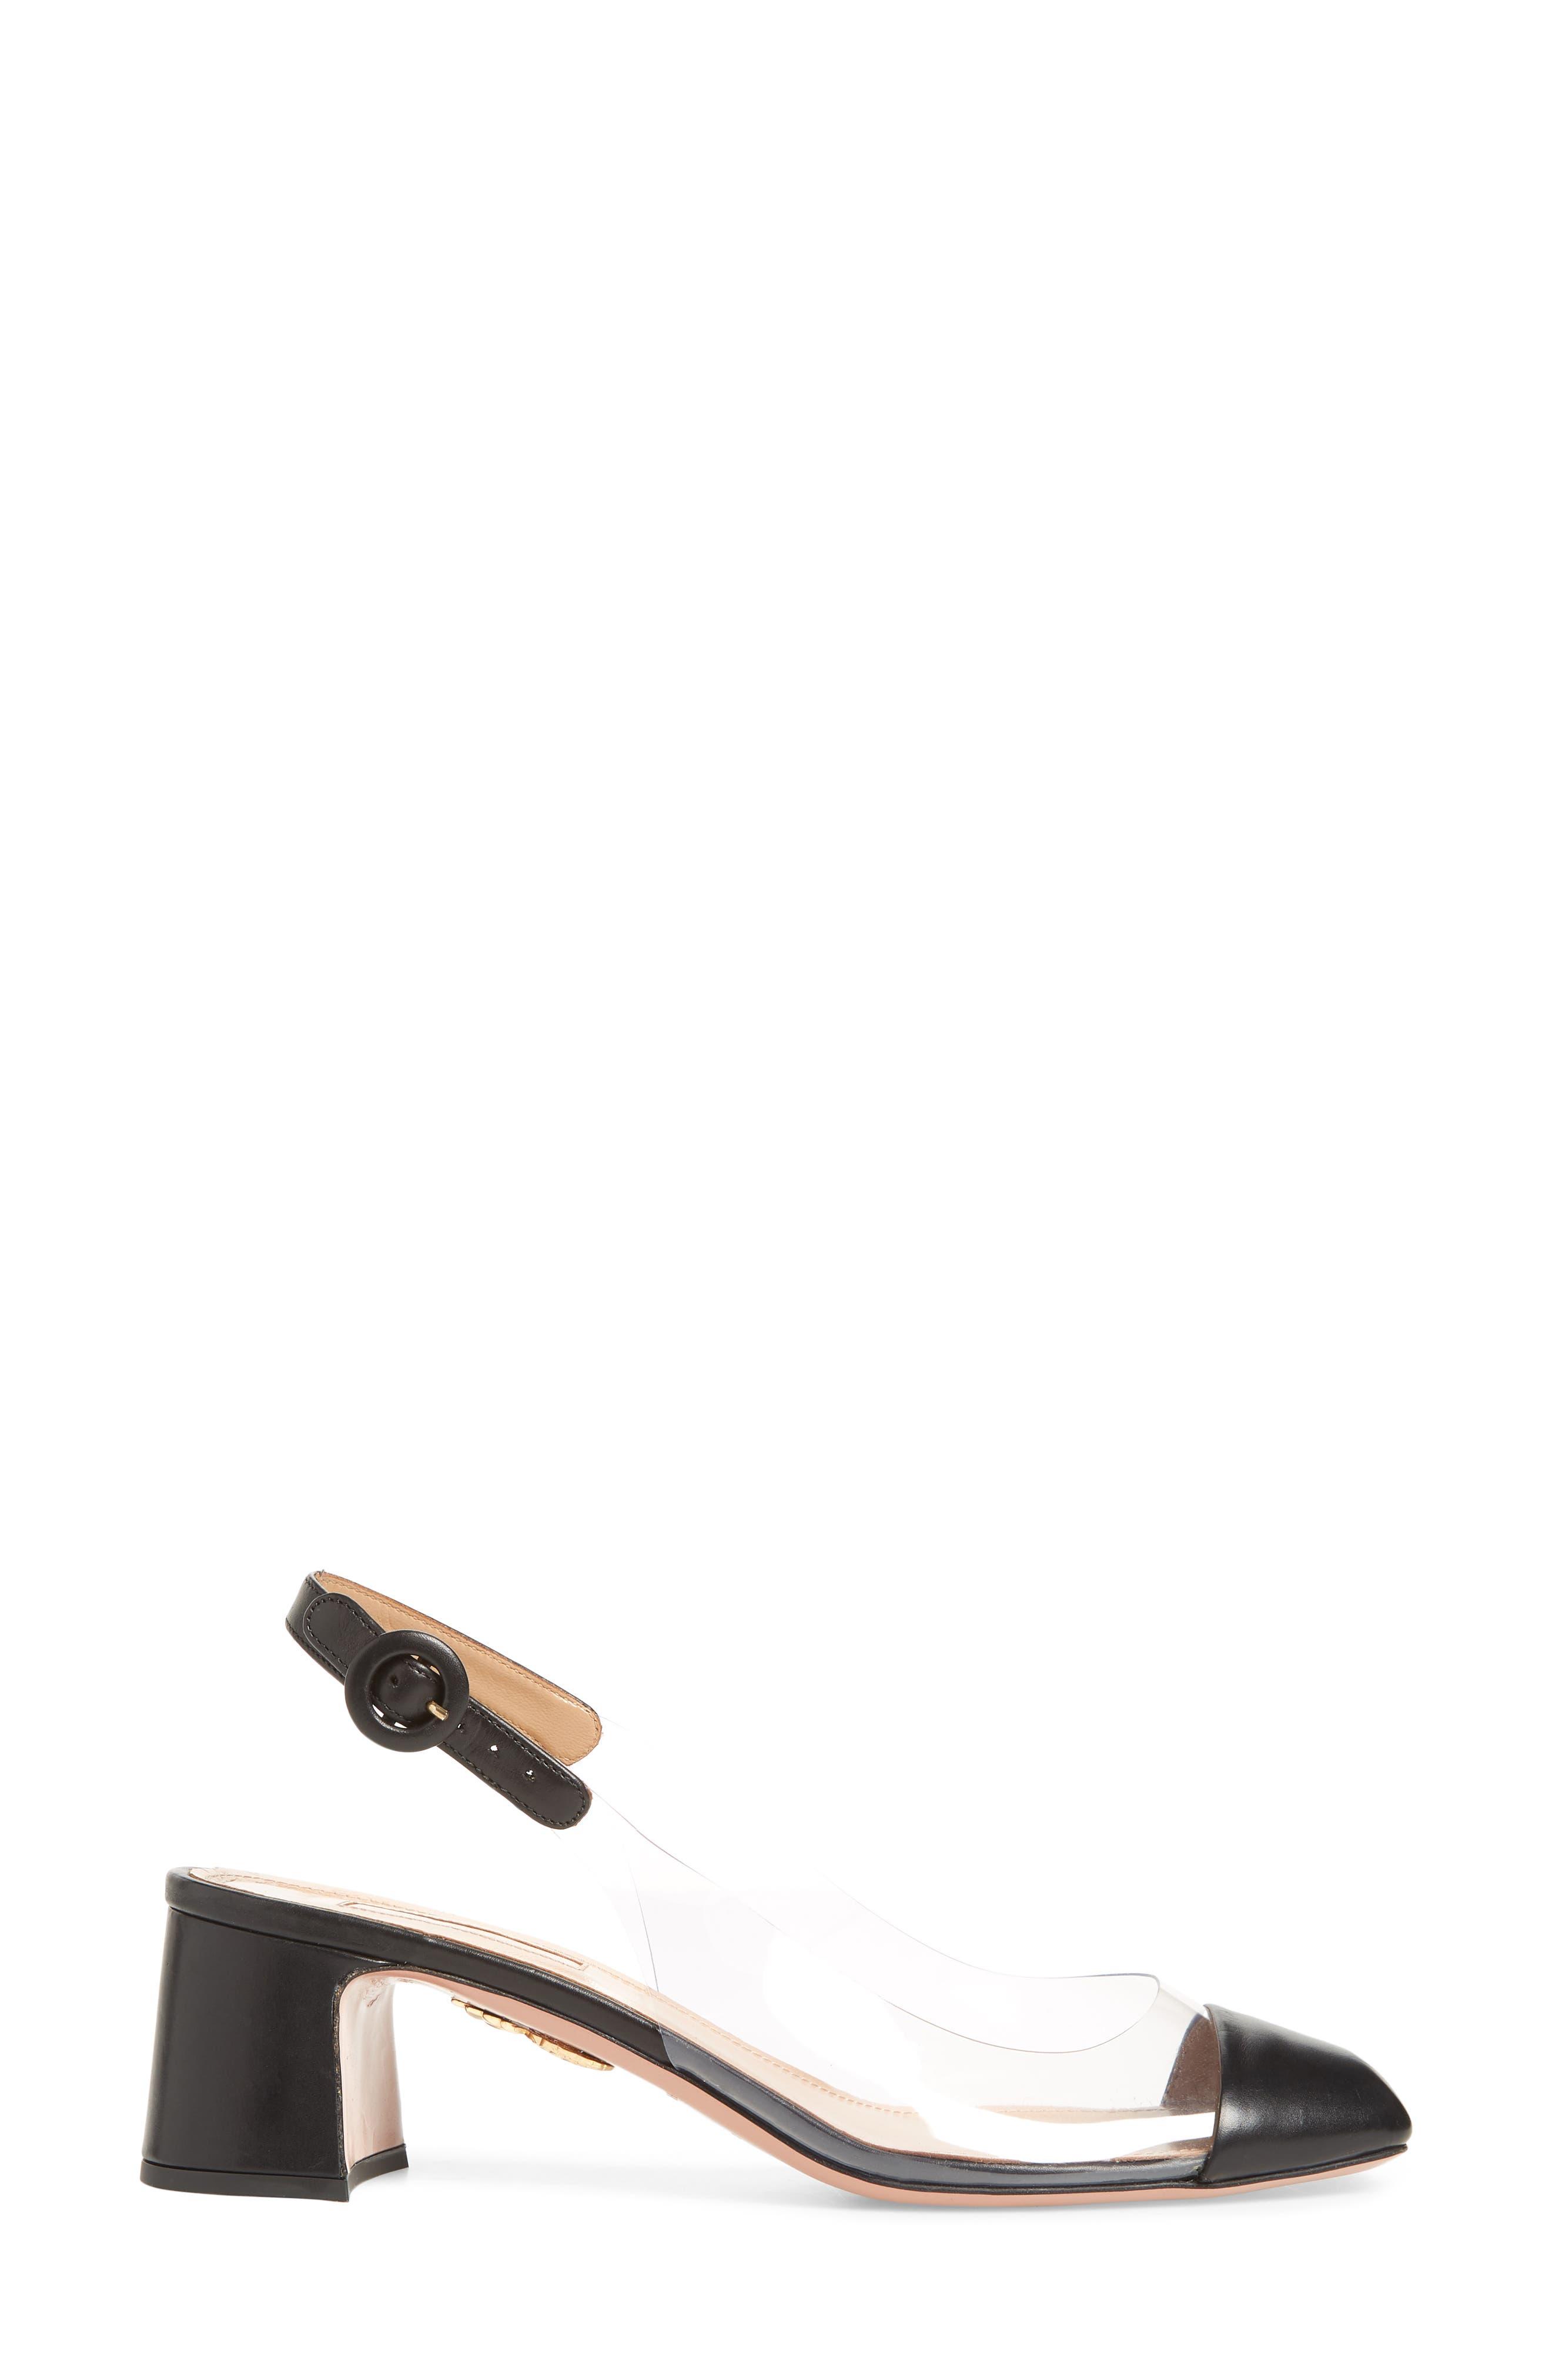 Optic Clear Slingback Pump,                             Alternate thumbnail 3, color,                             BLACK